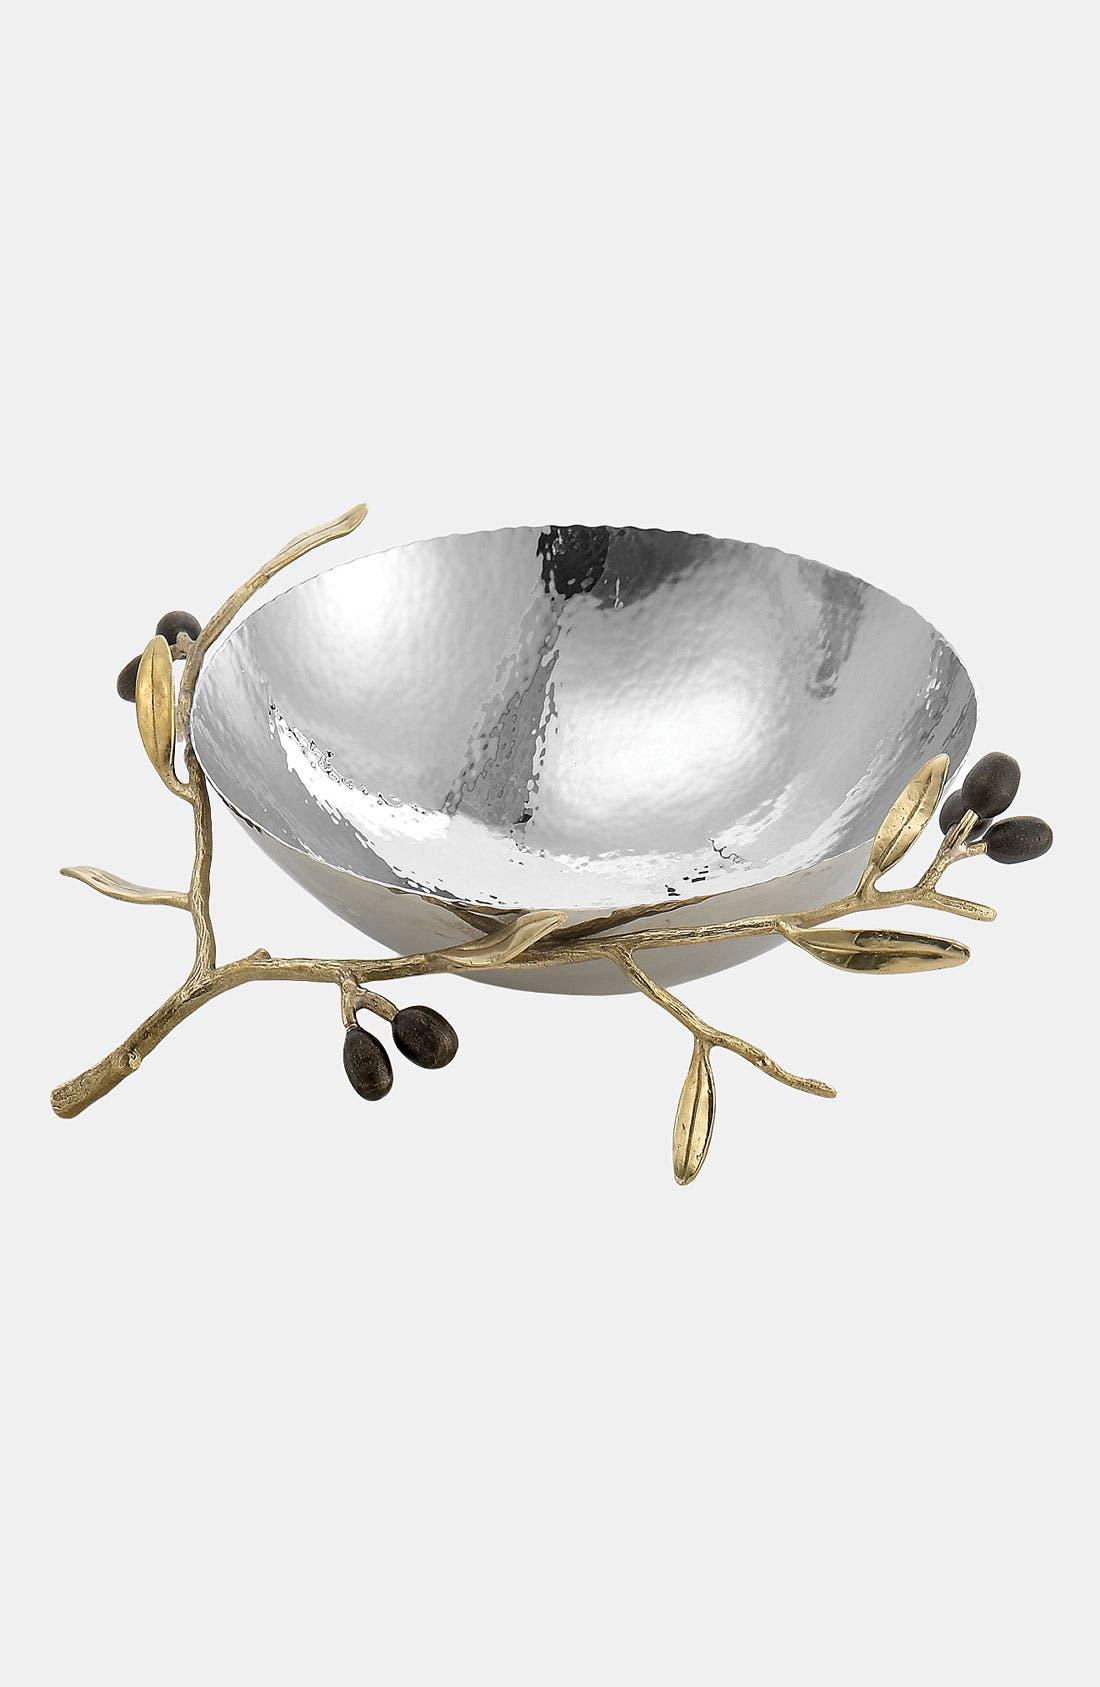 Alternate Image 1 Selected - Michael Aram 'Olive Branch Gold - Medium' Serving Bowl